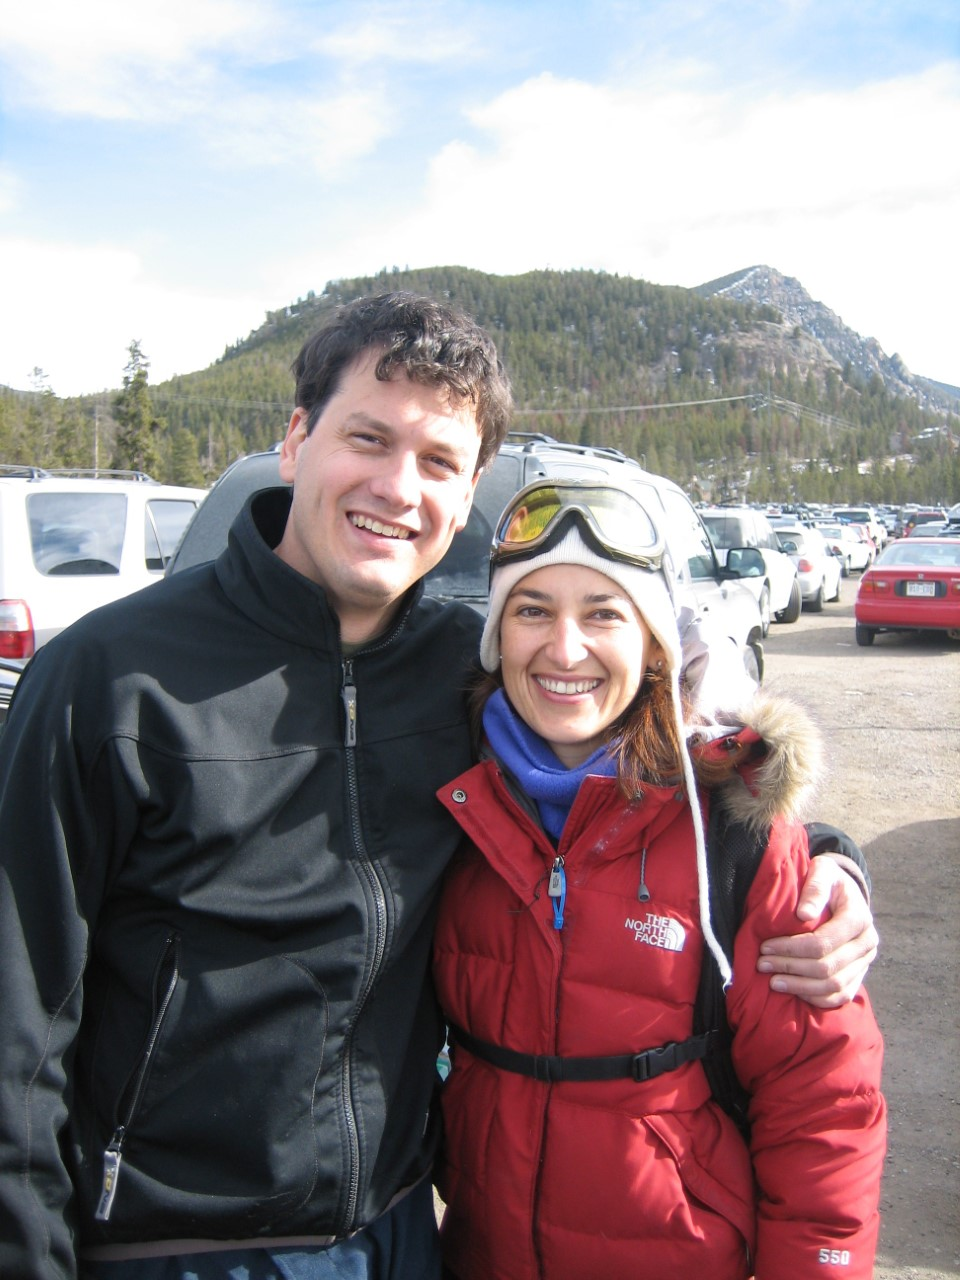 We met working on a ski mountain and love snowboarding! (2).jpg